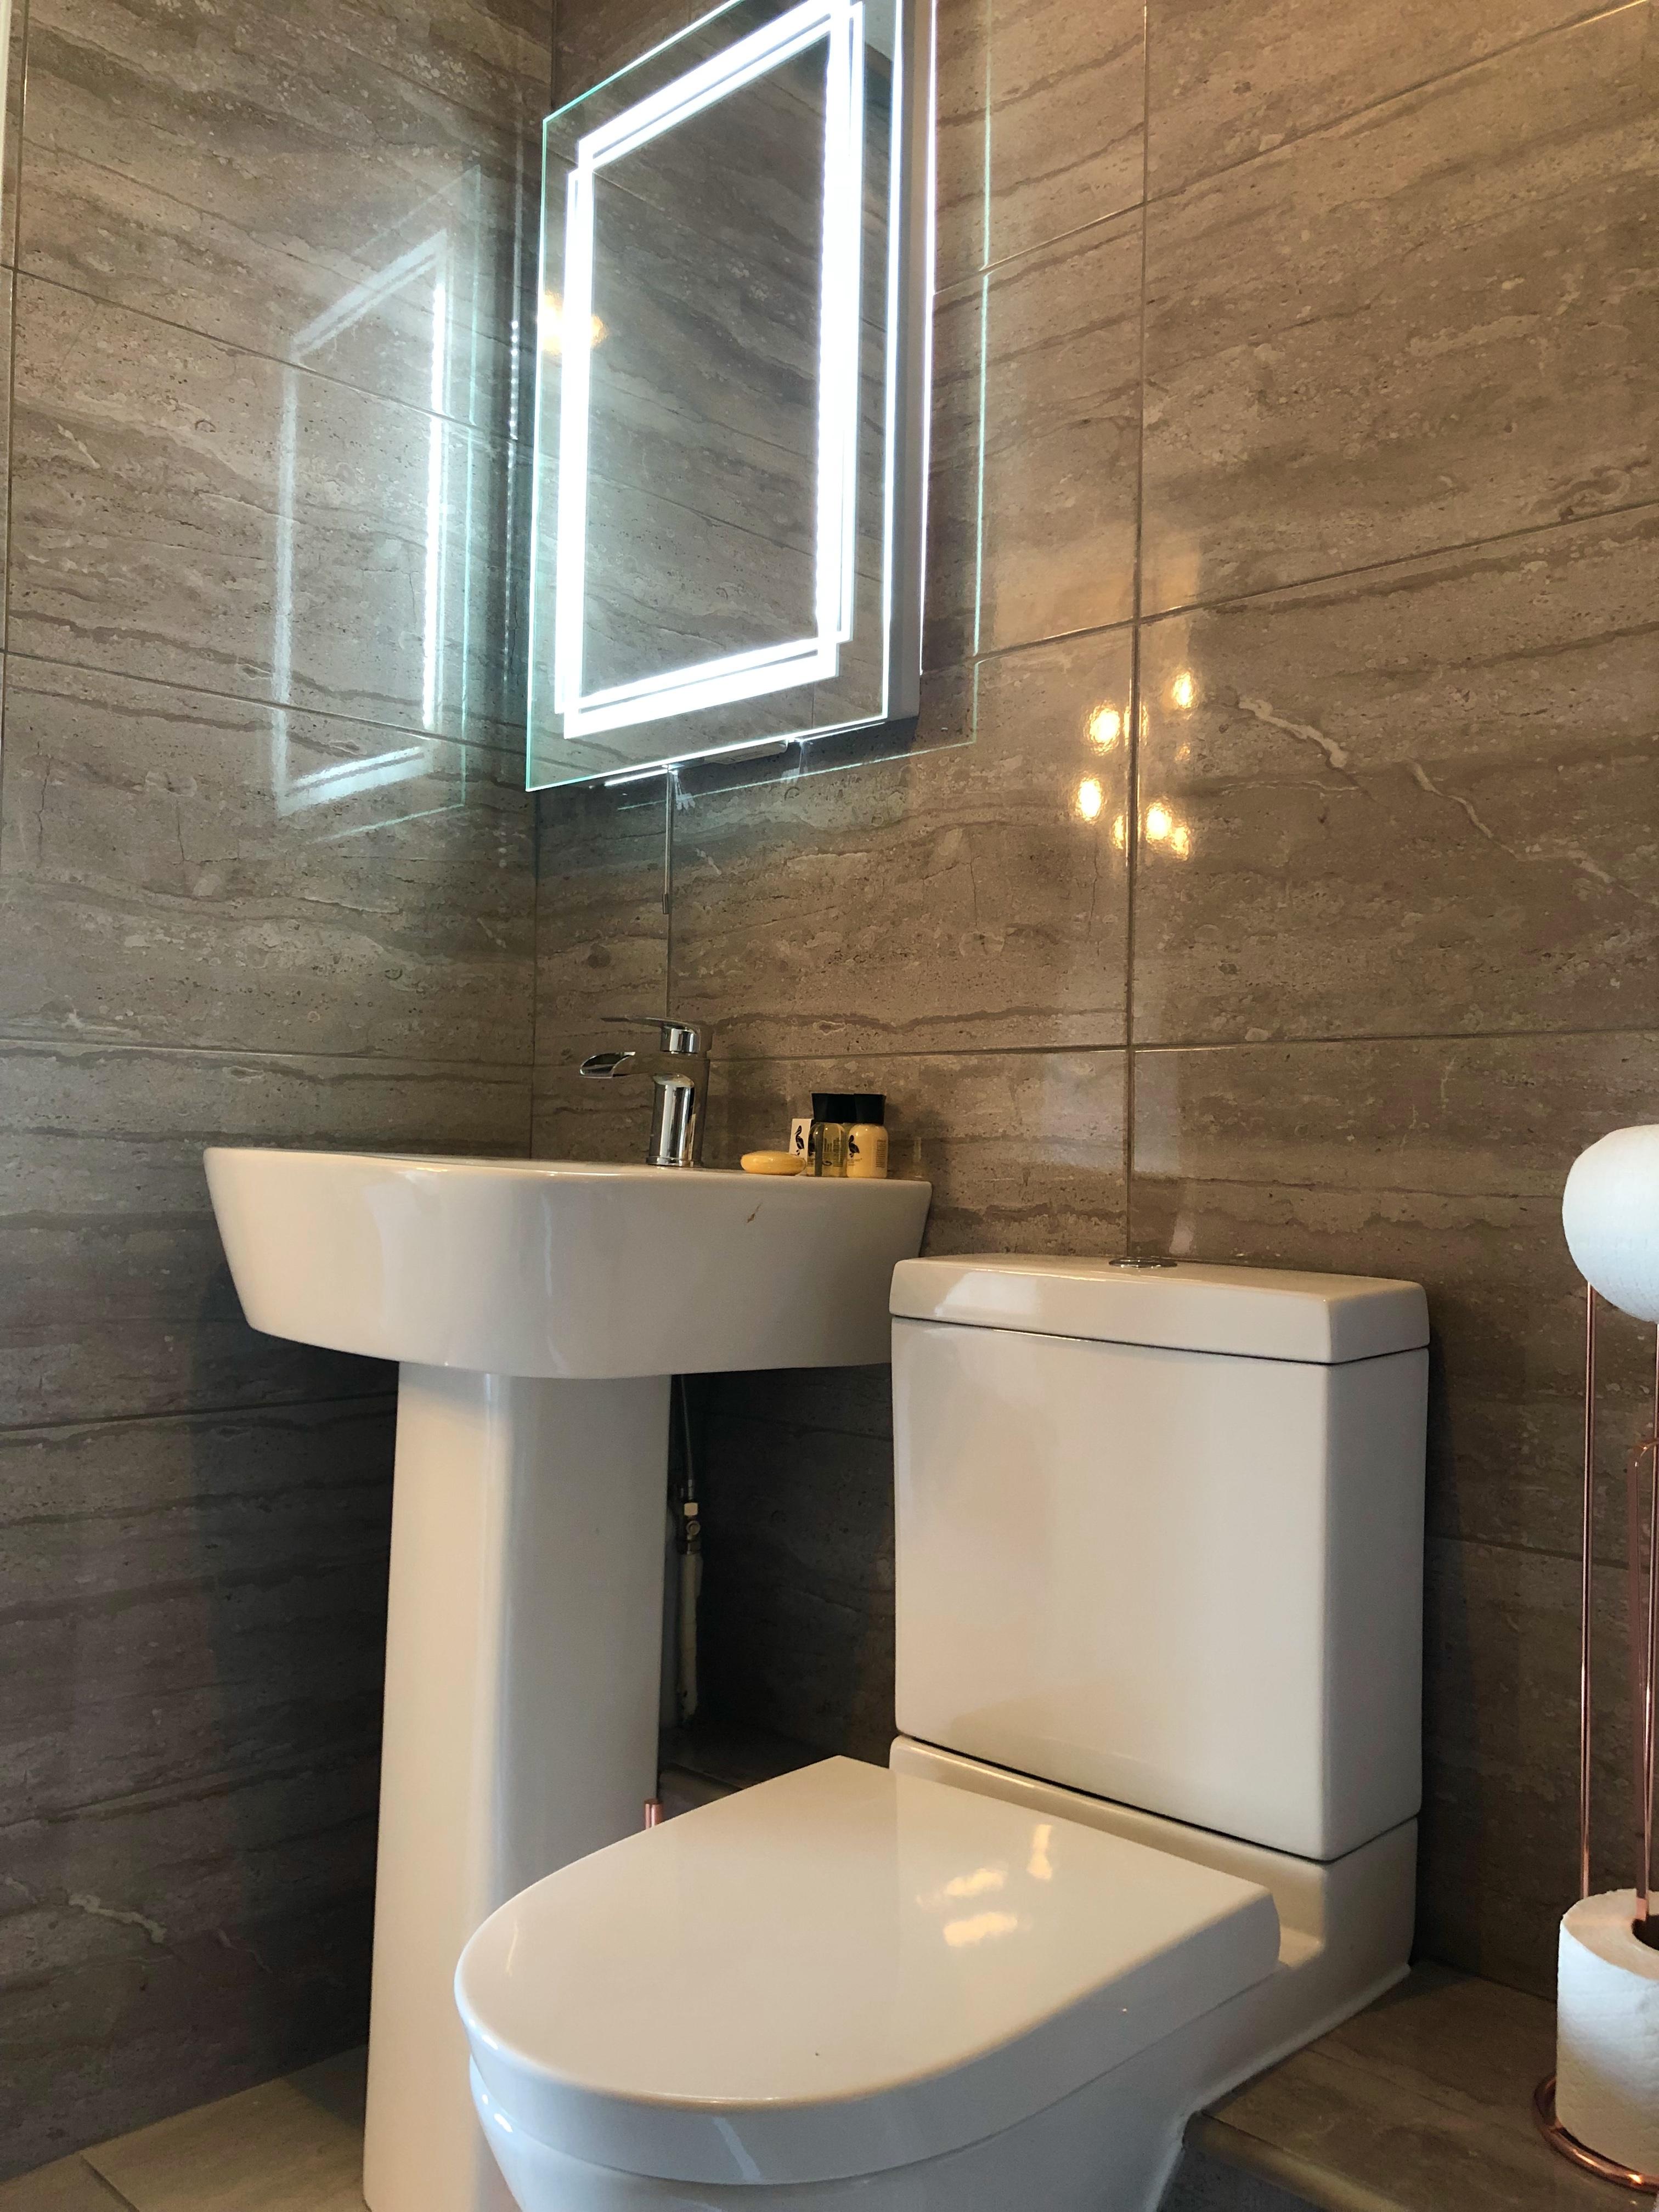 Room One Bathroom one